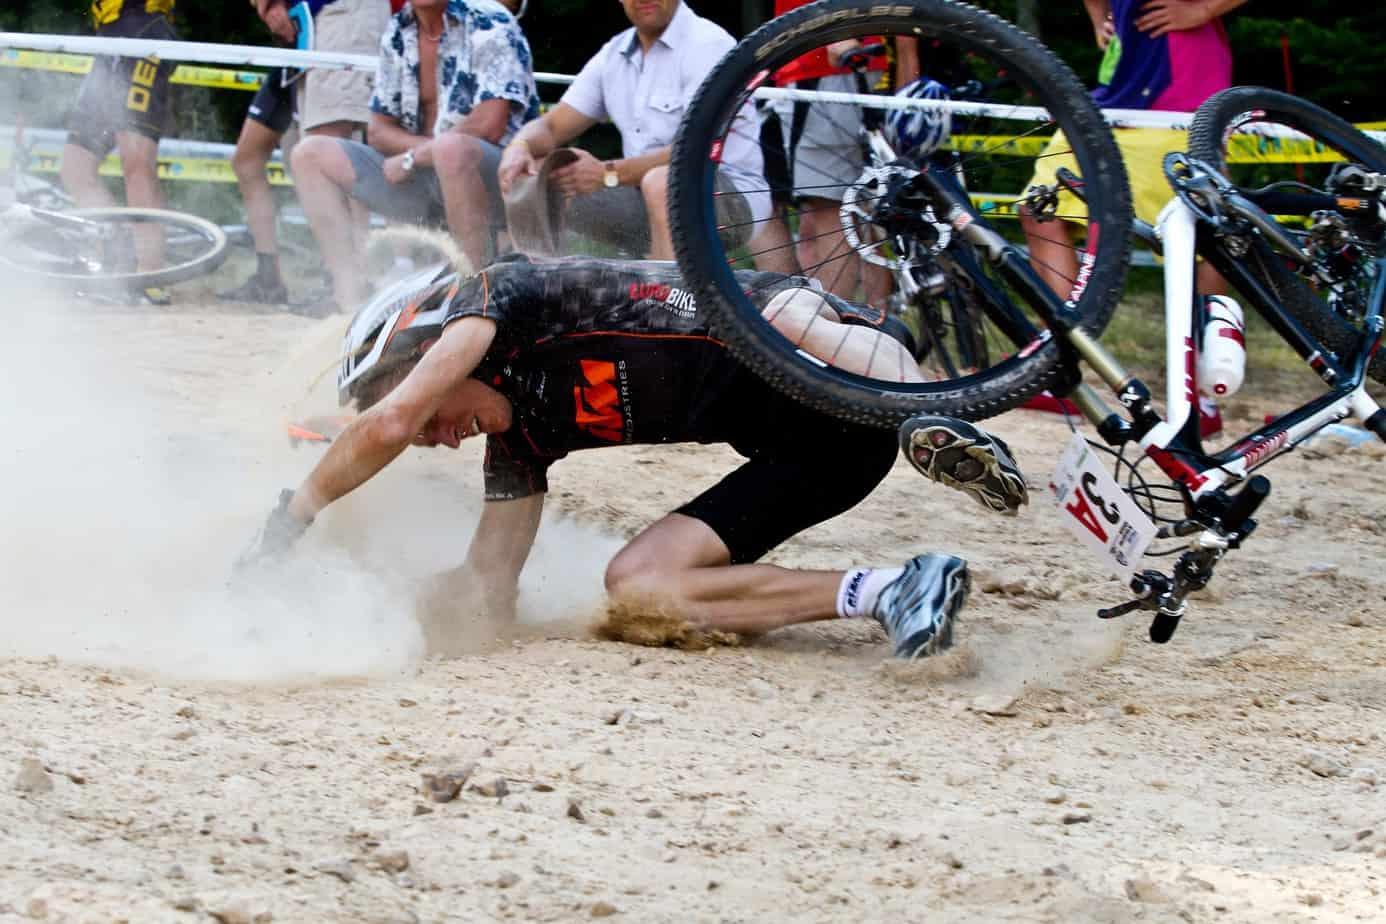 road rash injury pictures